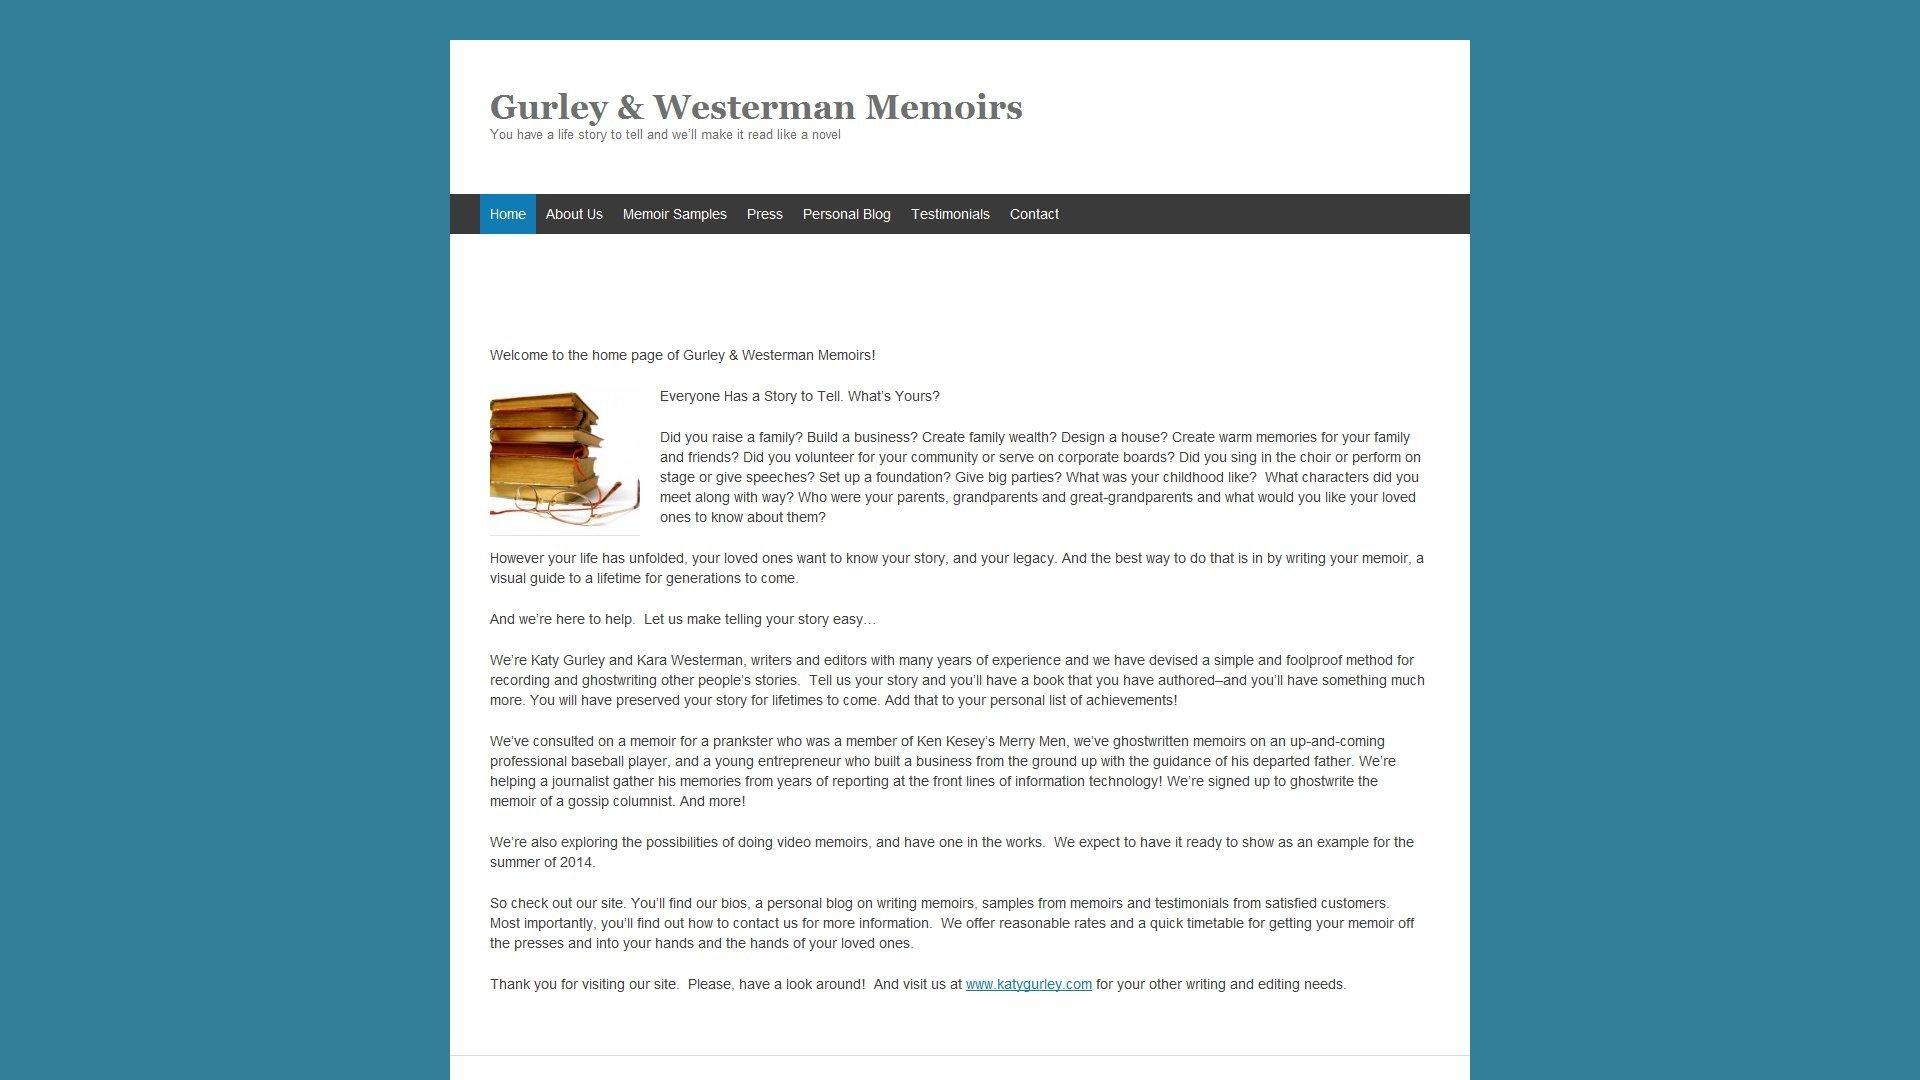 gurleyandwestermanmemoirs.com_